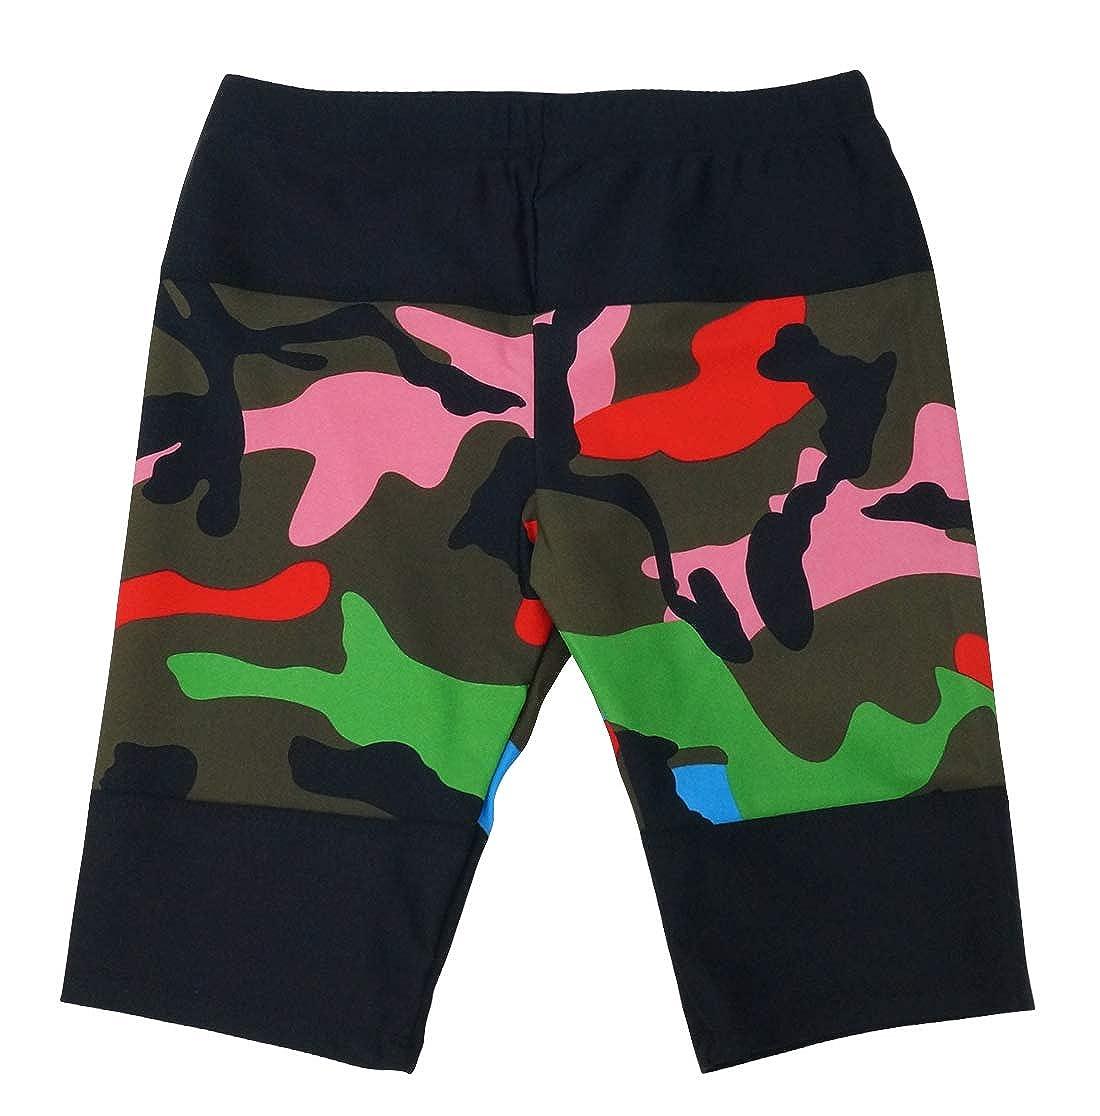 Happy Cherry Kids Cute Elastic Swim Short Quick Dry Board Shorts Slim Fit Swimsuit